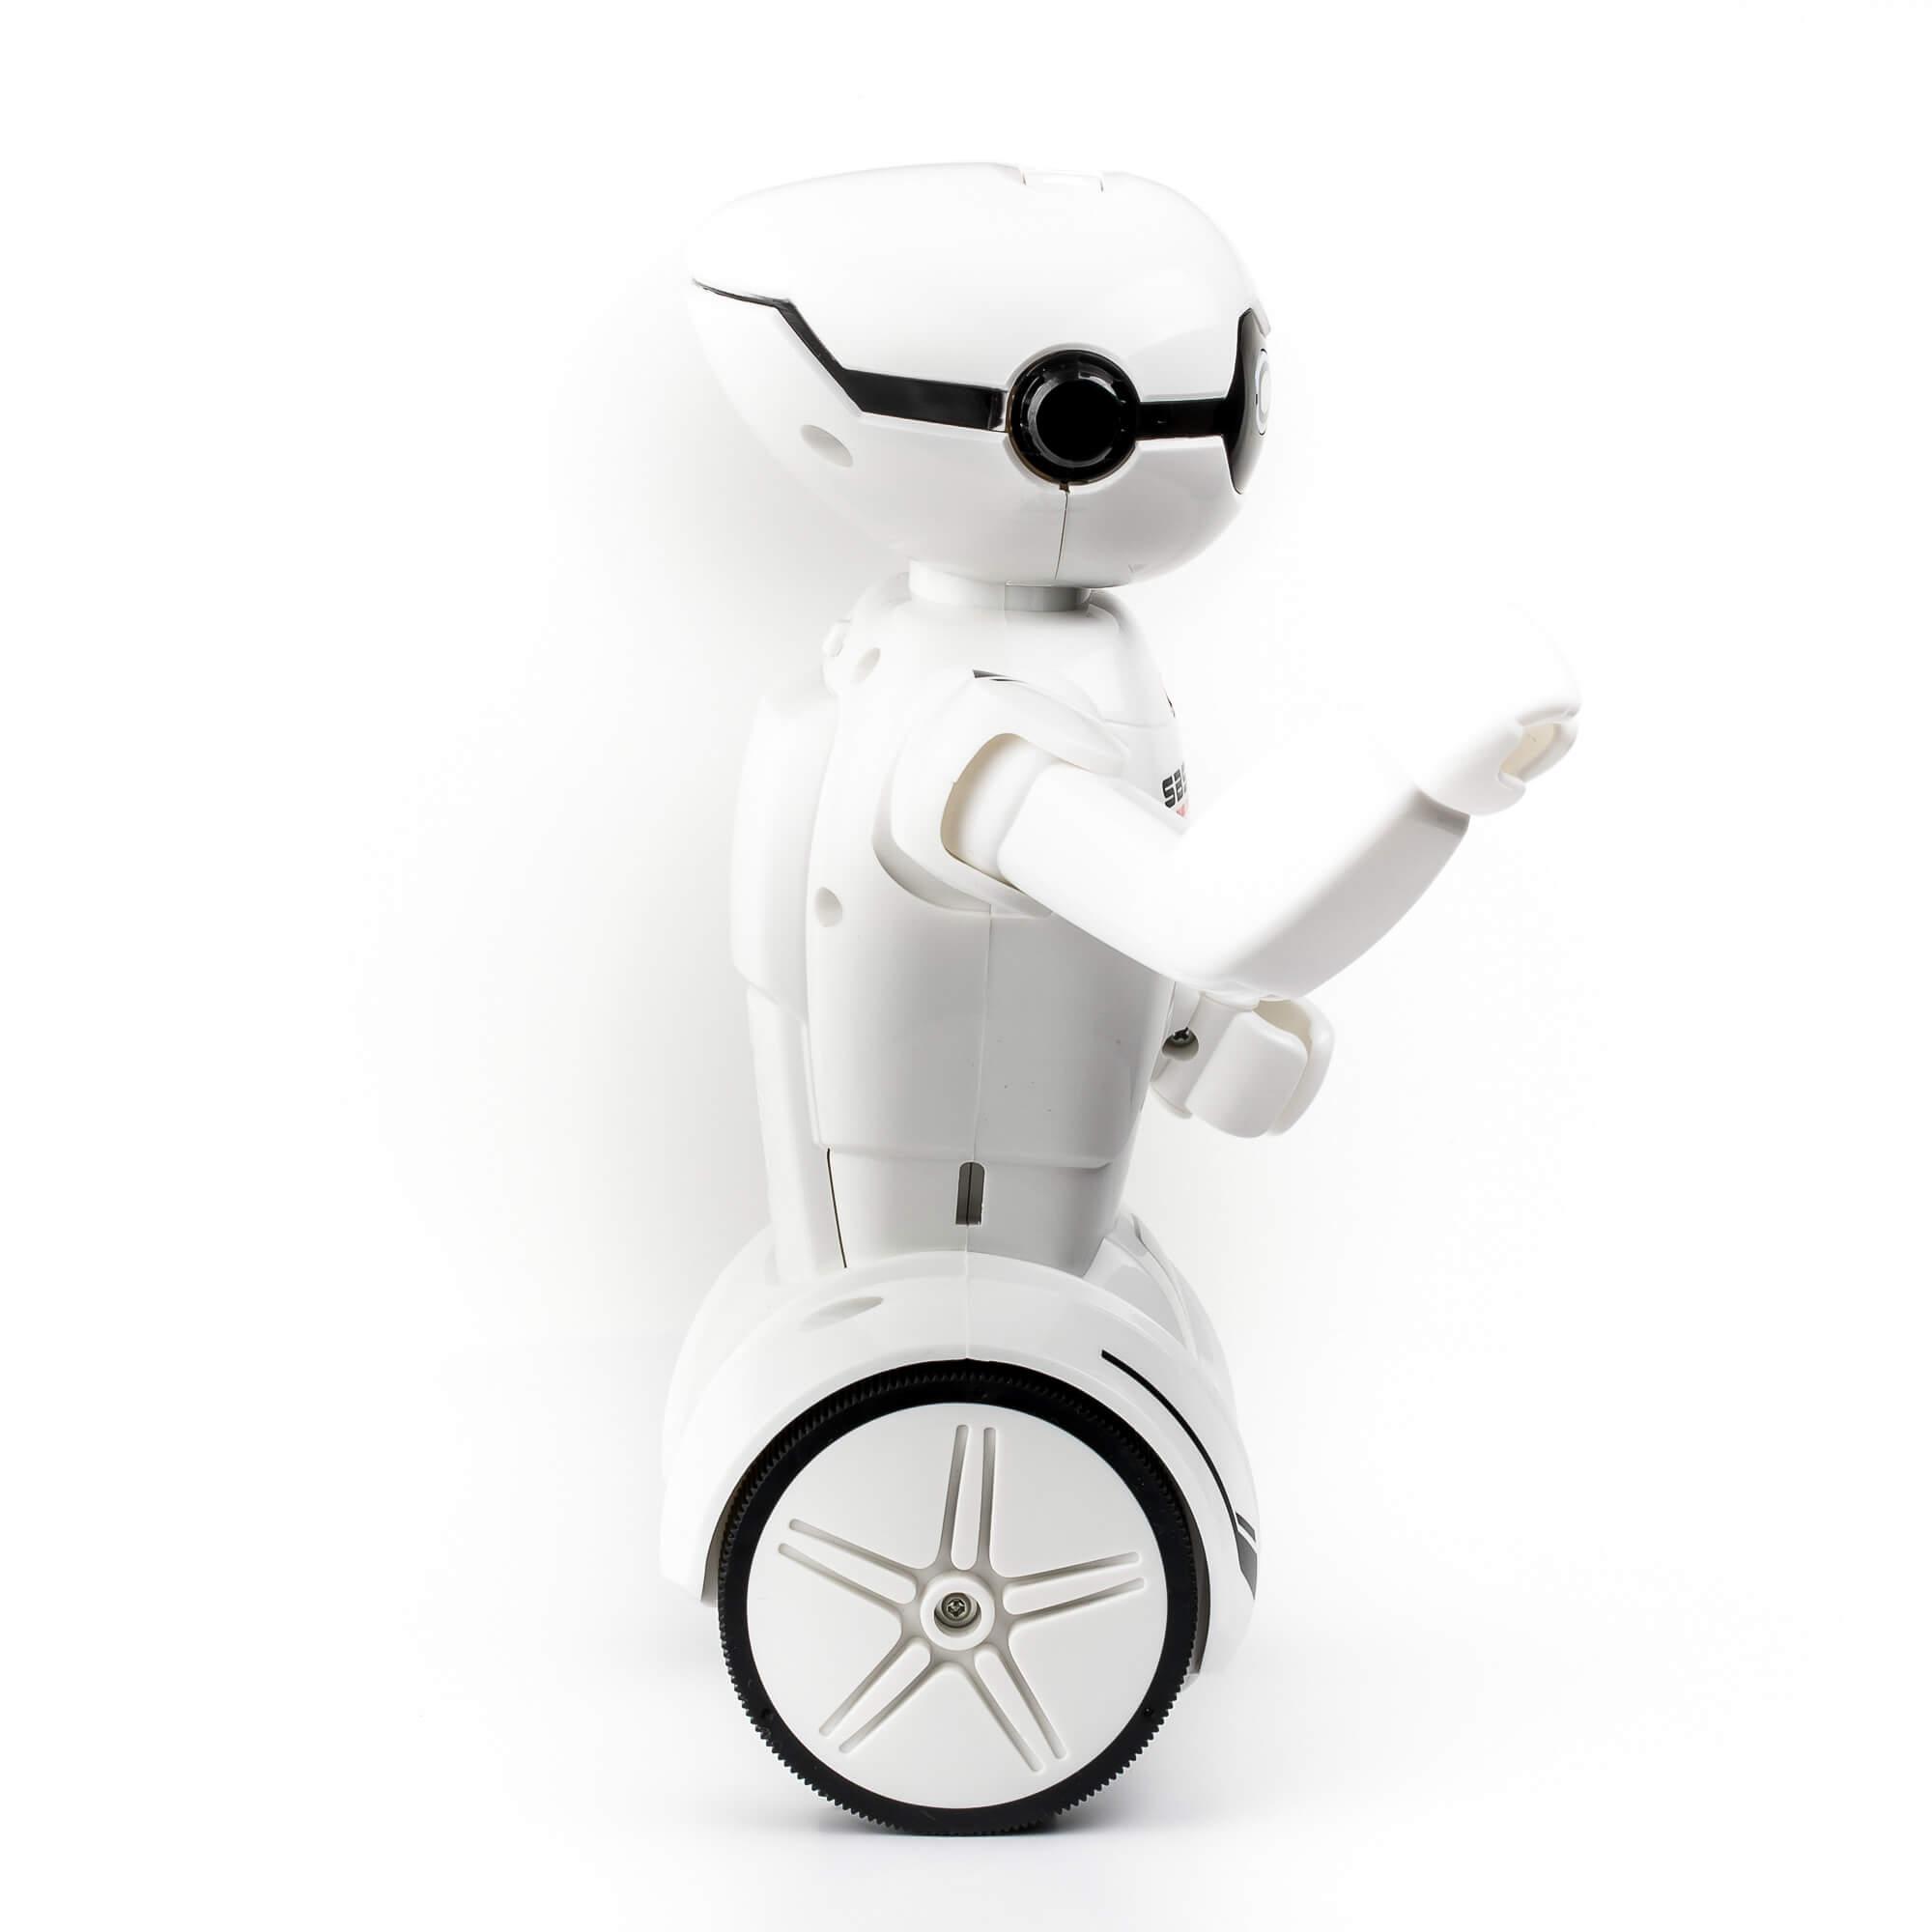 MacroBot